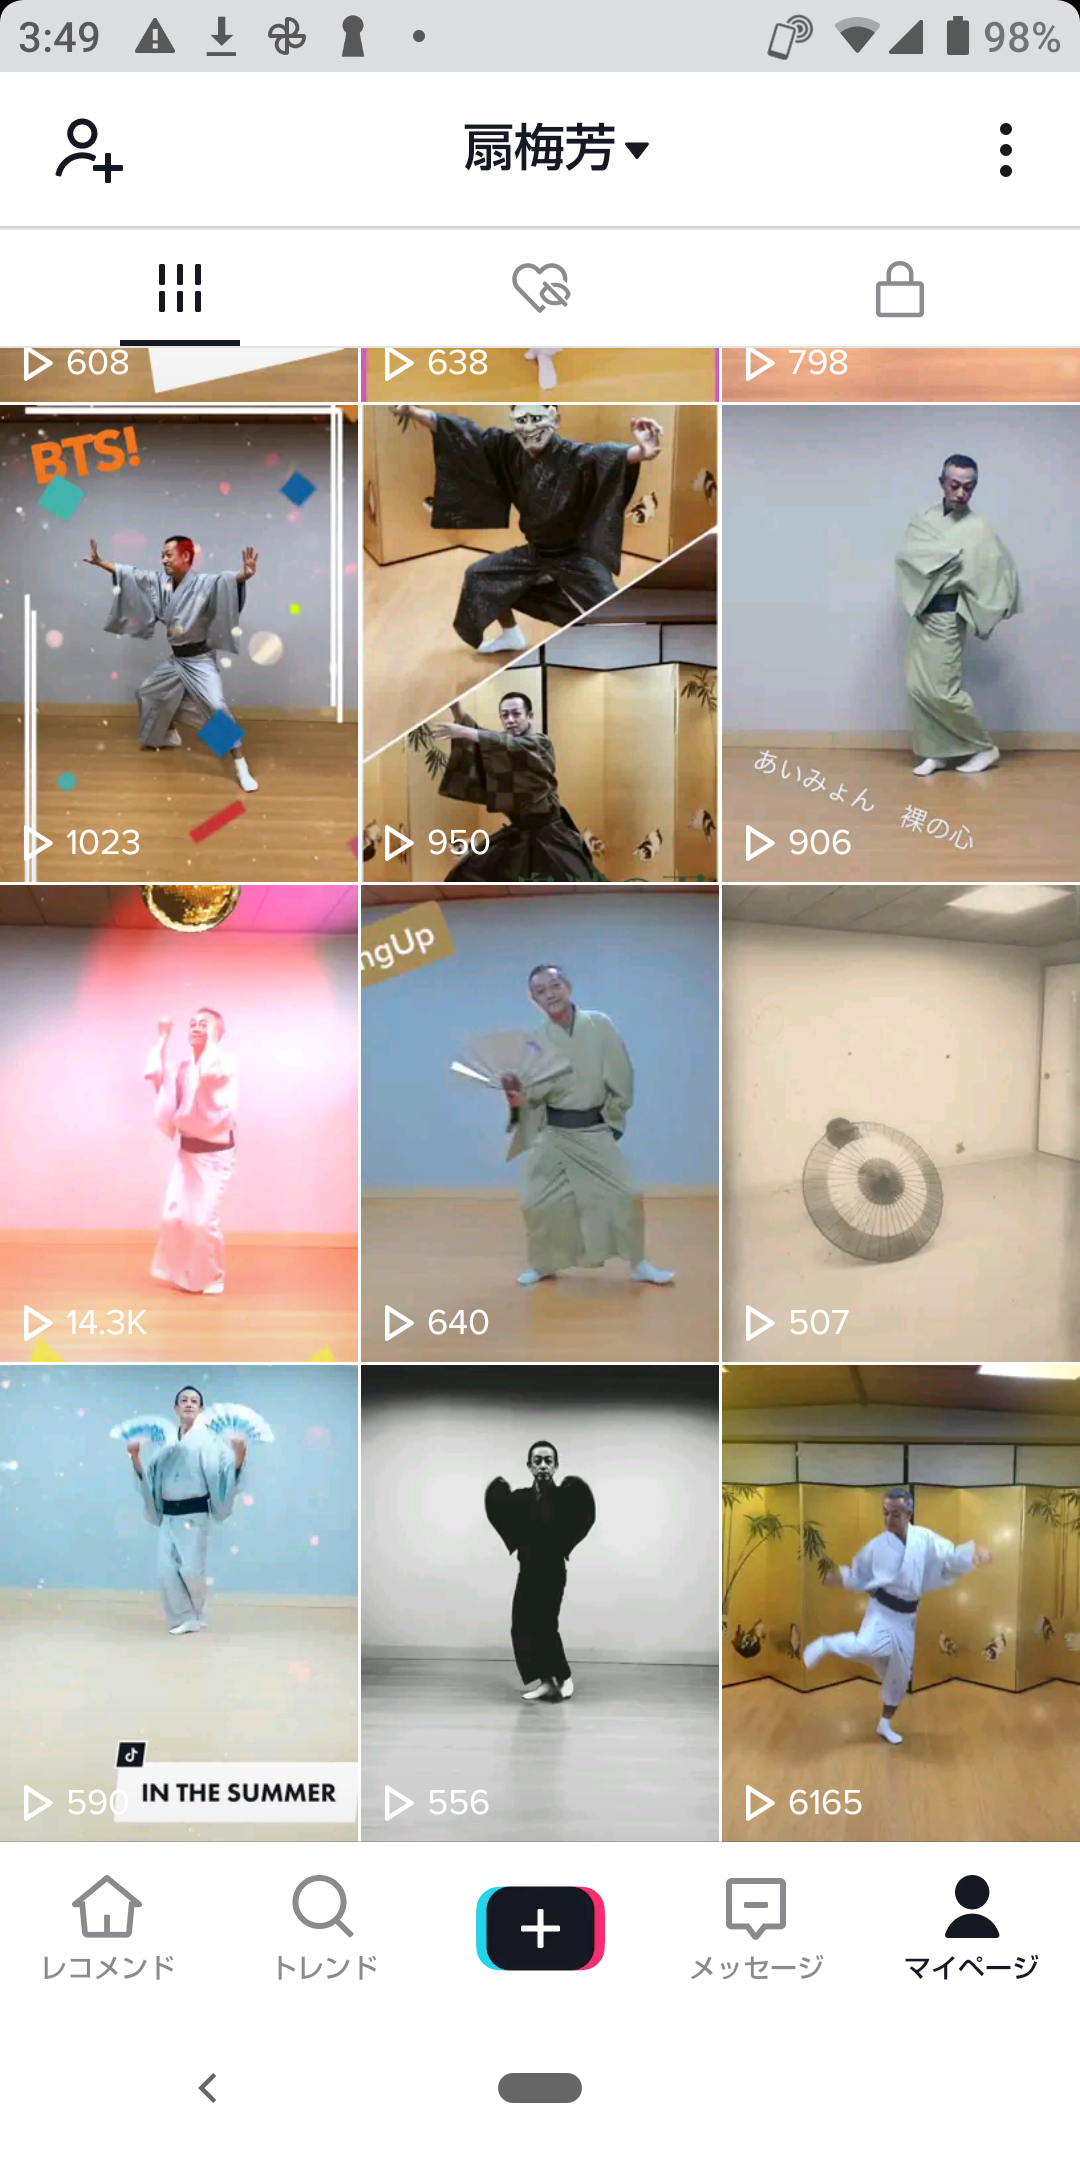 TikTok 日舞ダンス教室